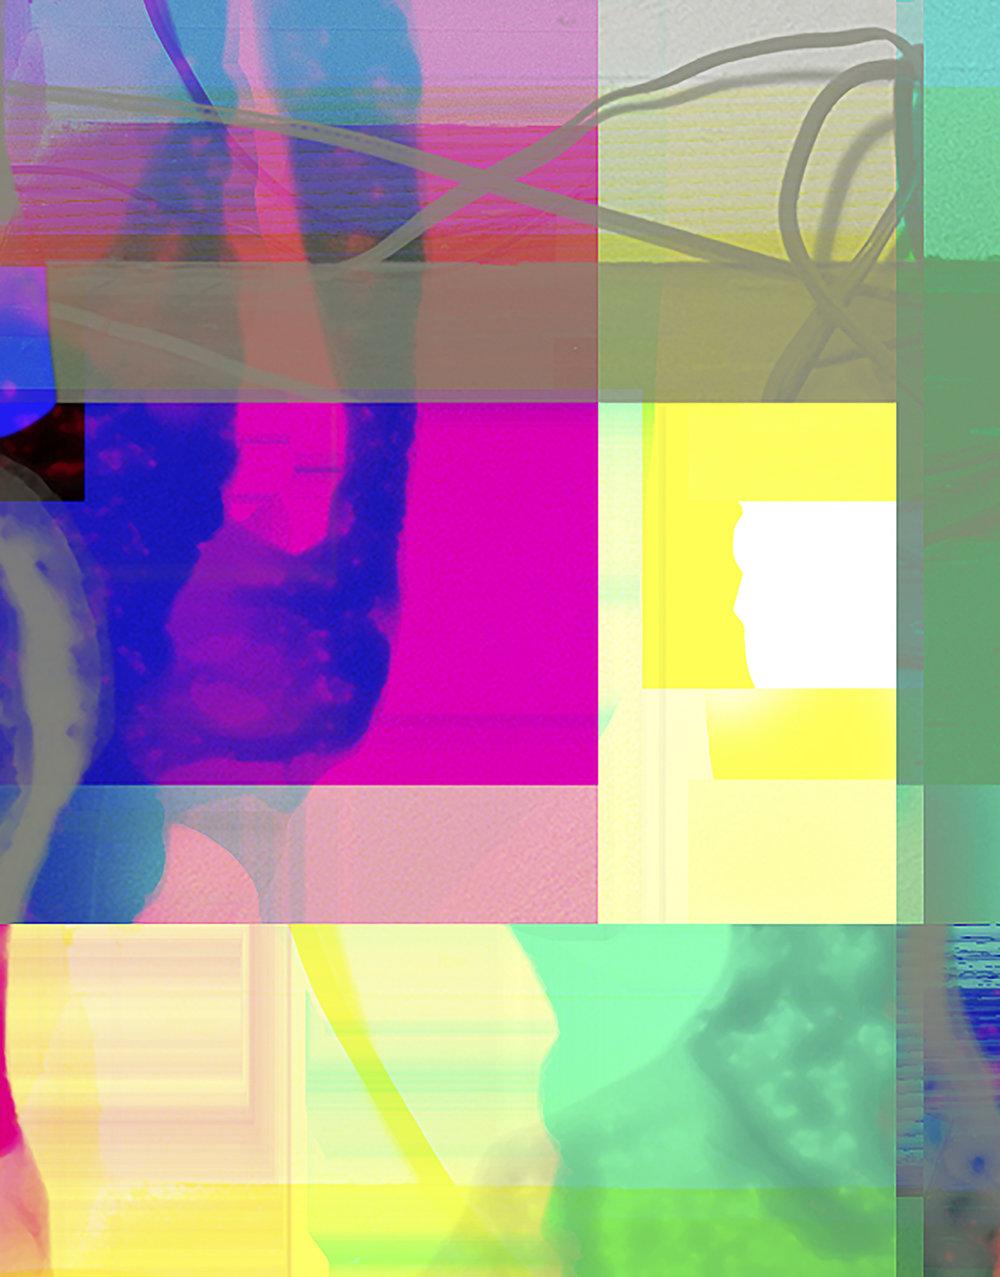 Untitled(3.49.43).jpg